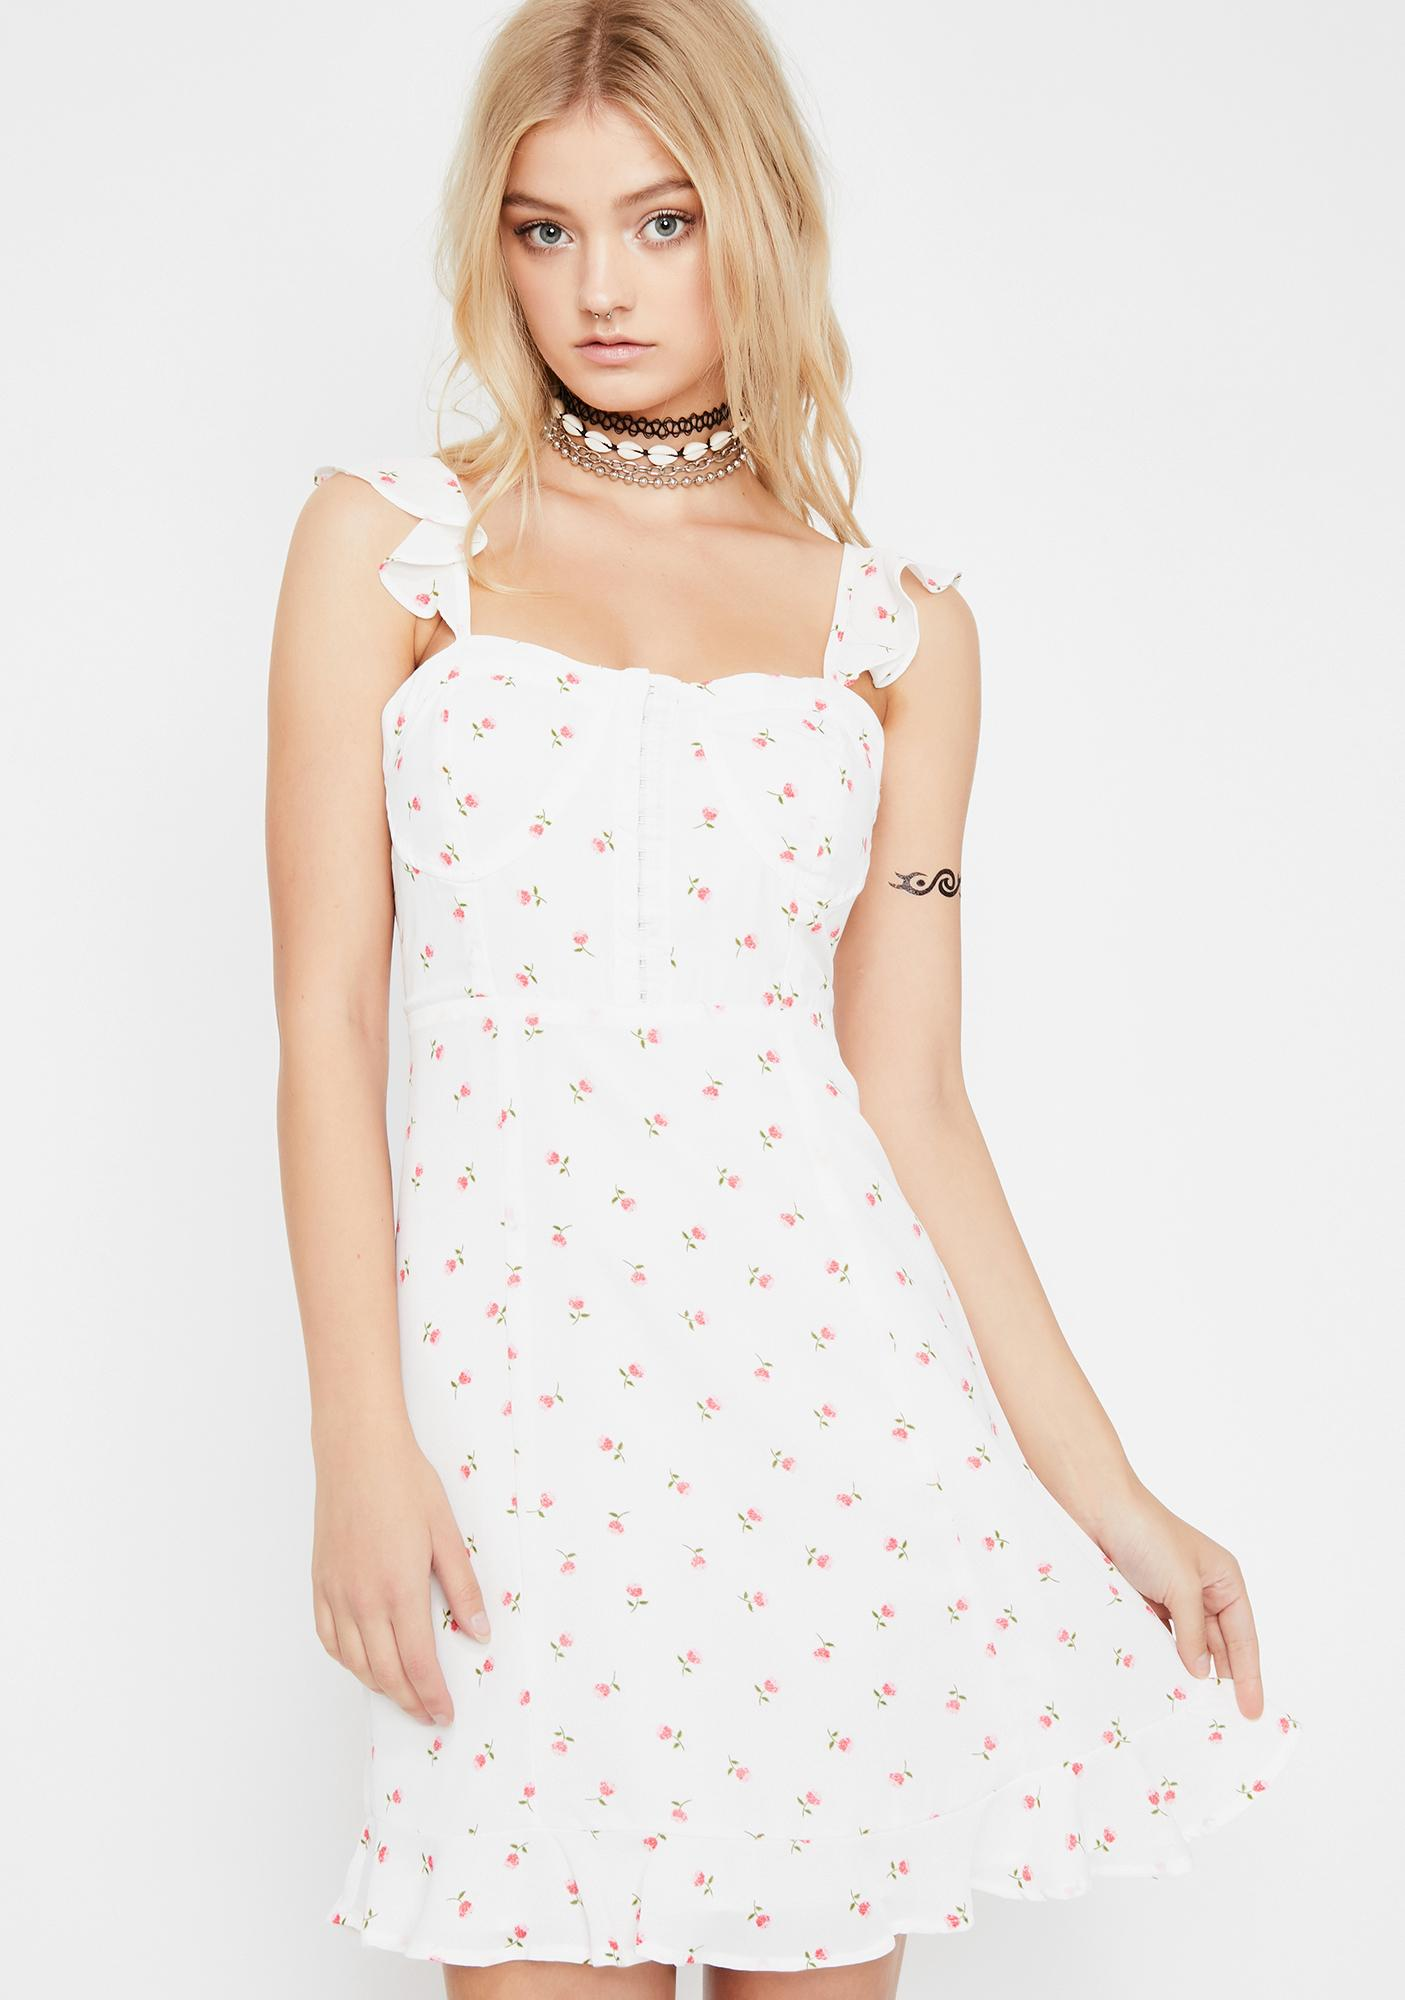 Pure Fresh Faced Cutie Floral Dress